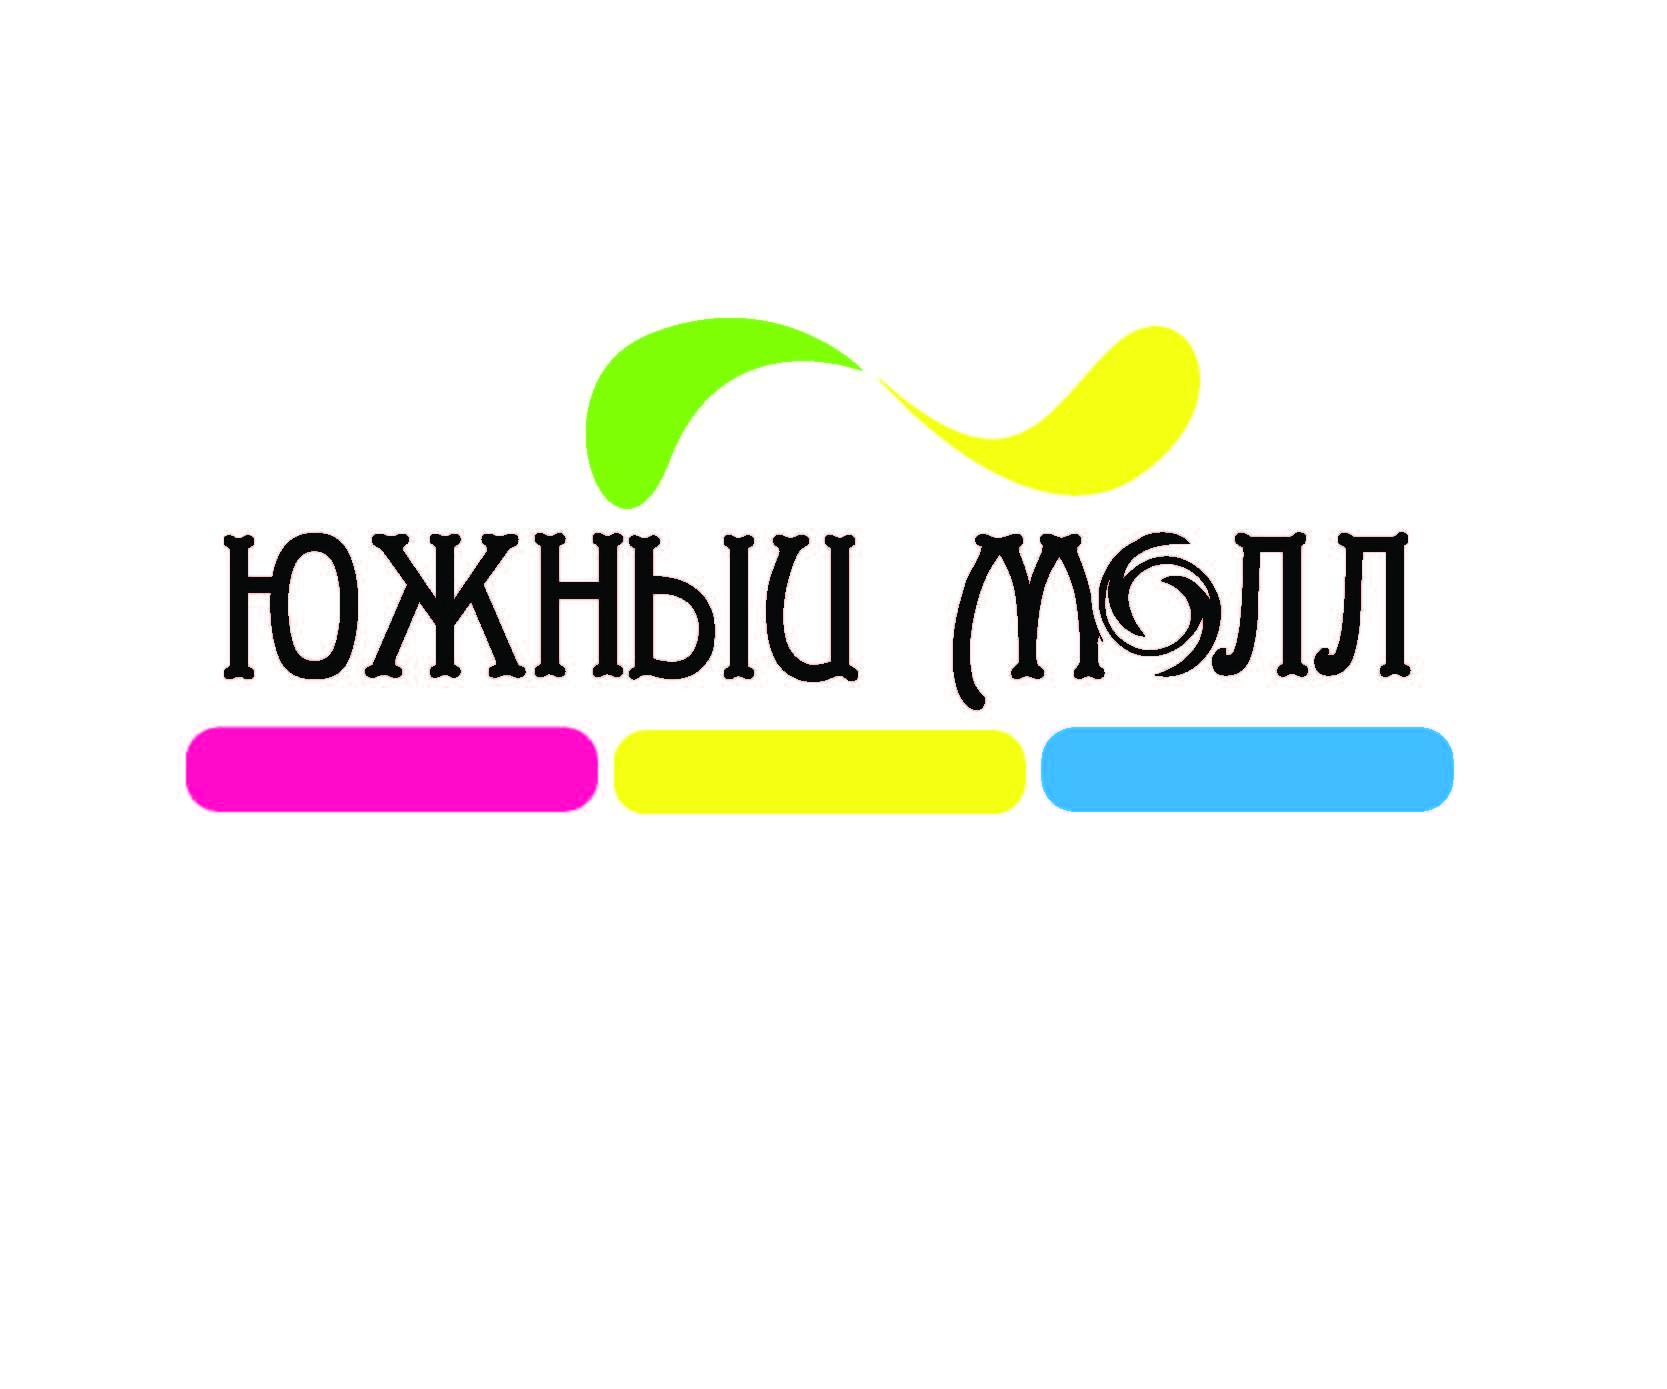 Разработка логотипа фото f_4db1c999795c1.jpg